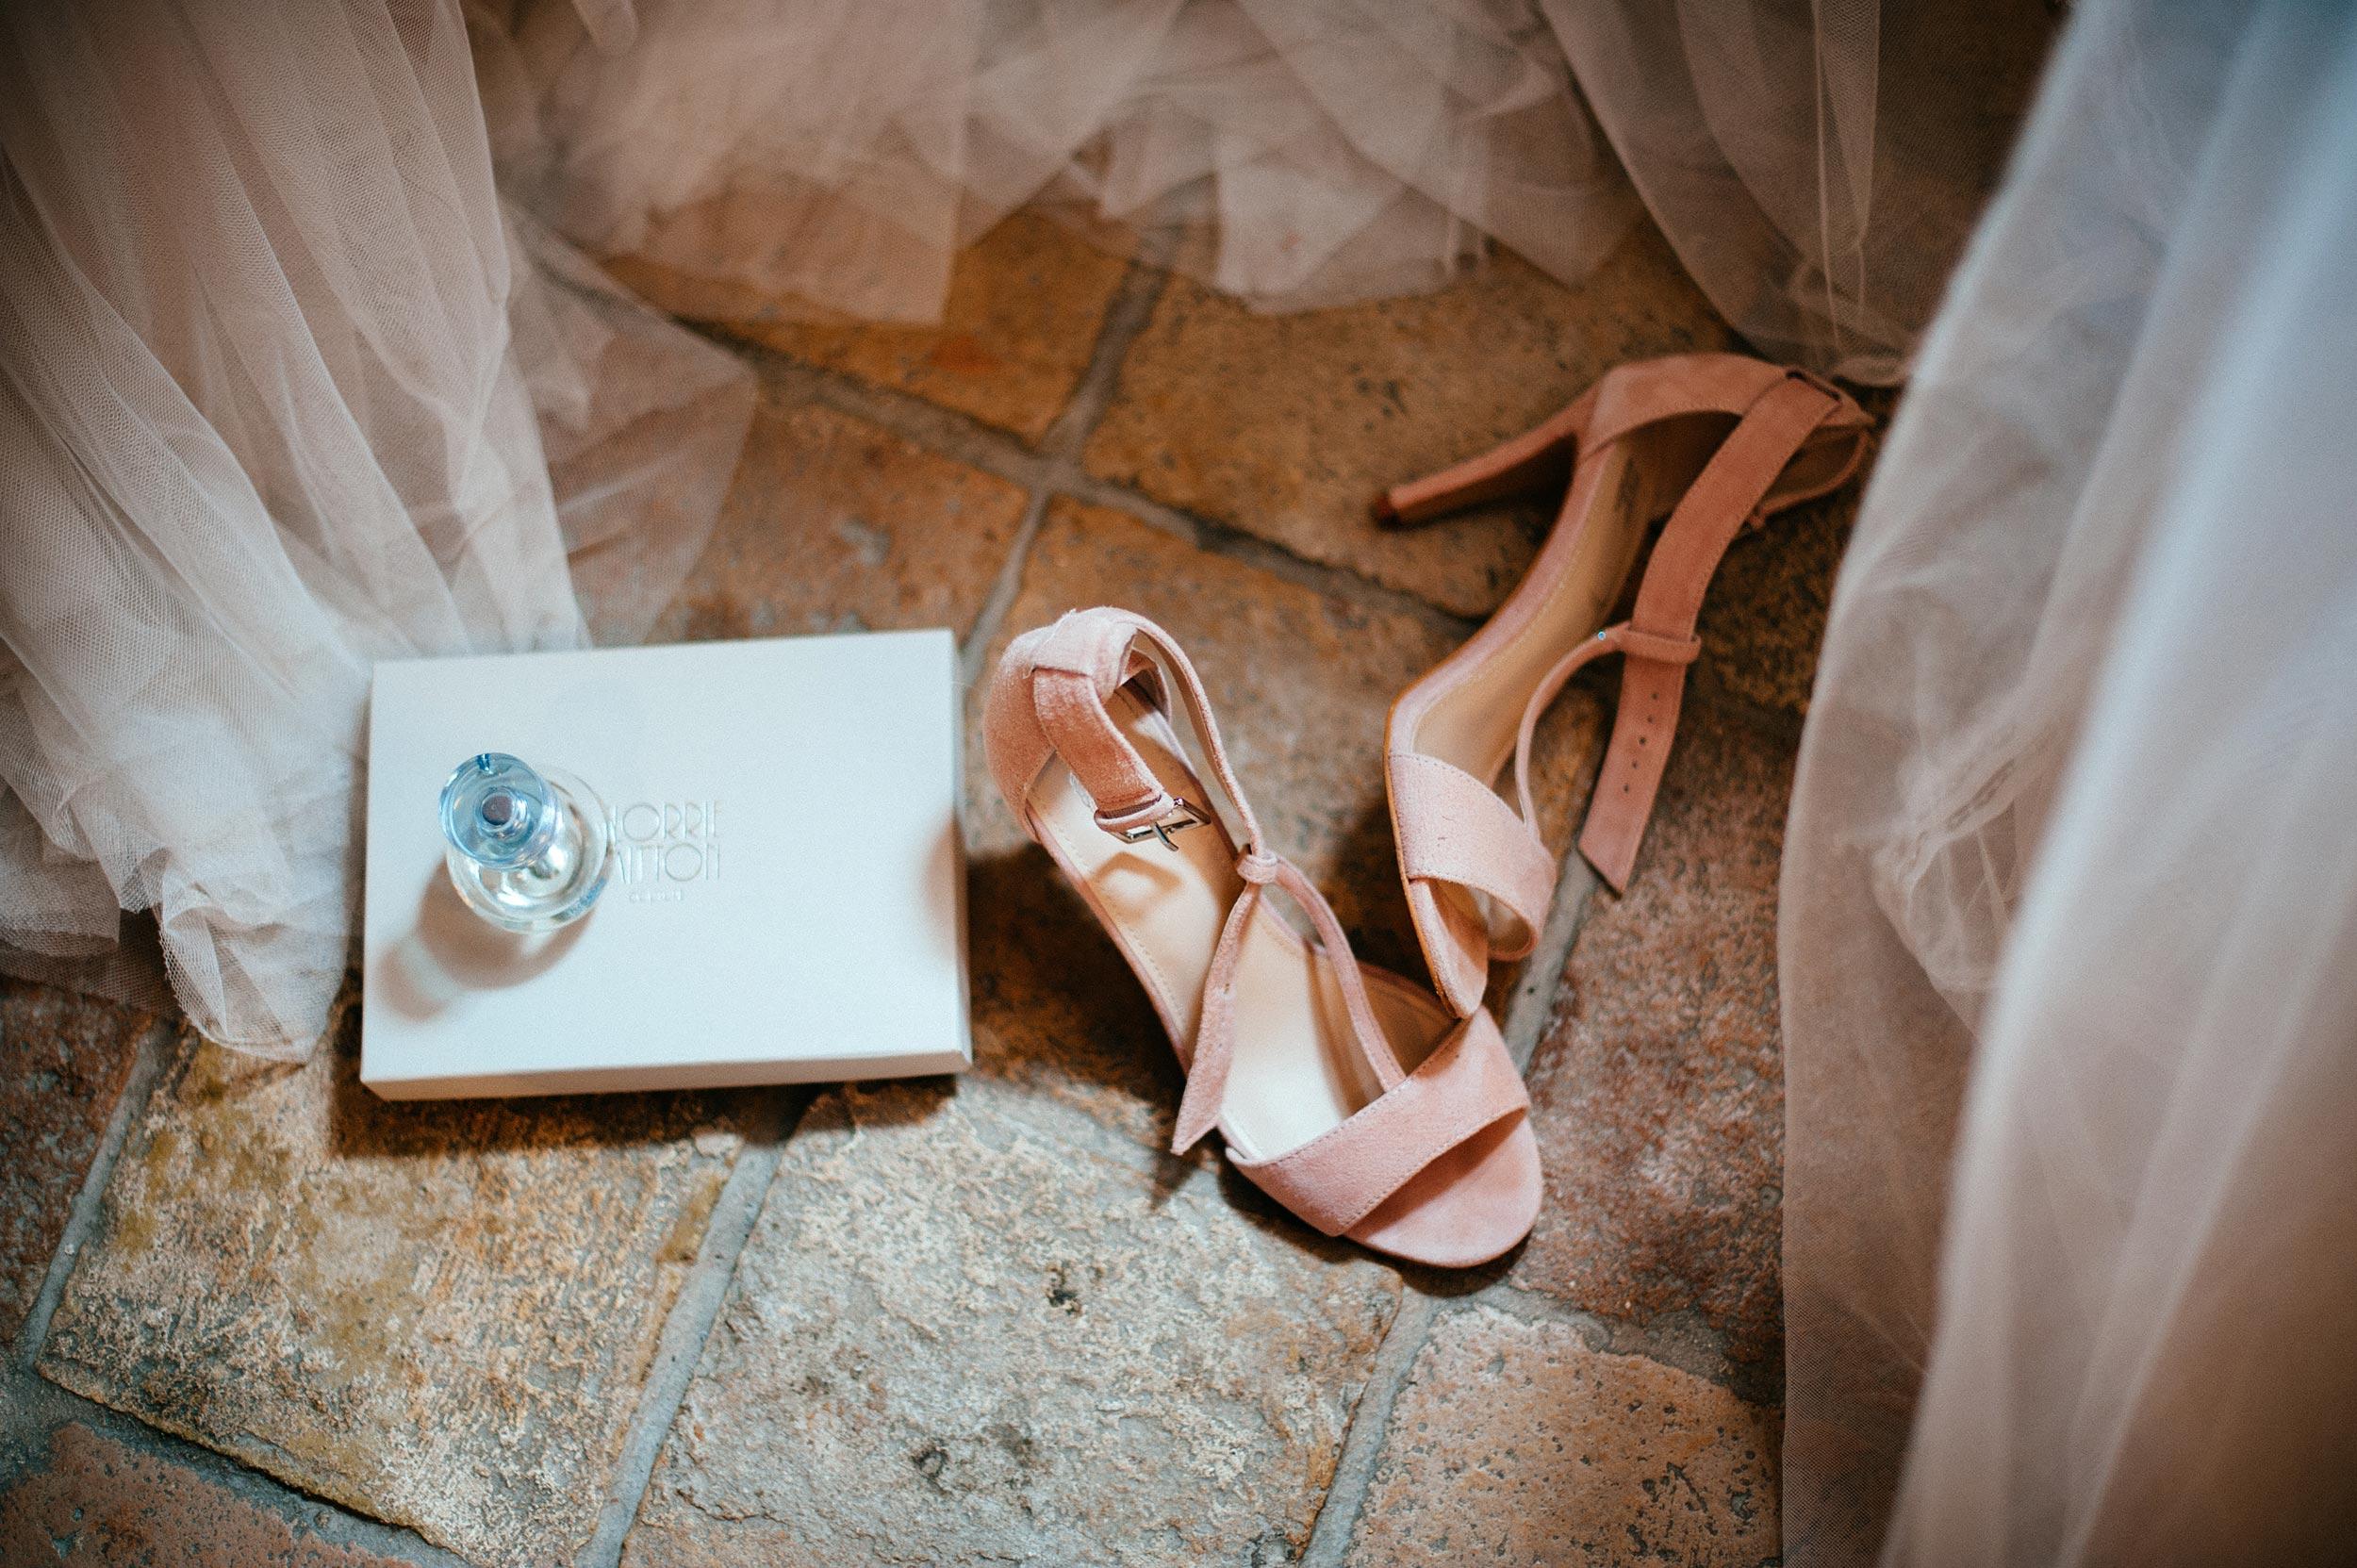 2014-Shelby-Jocelyn-Santo-Stefano-Di-Sessanio-Wedding-Photographer-Italy-Alessandro-Avenali-2.jpg